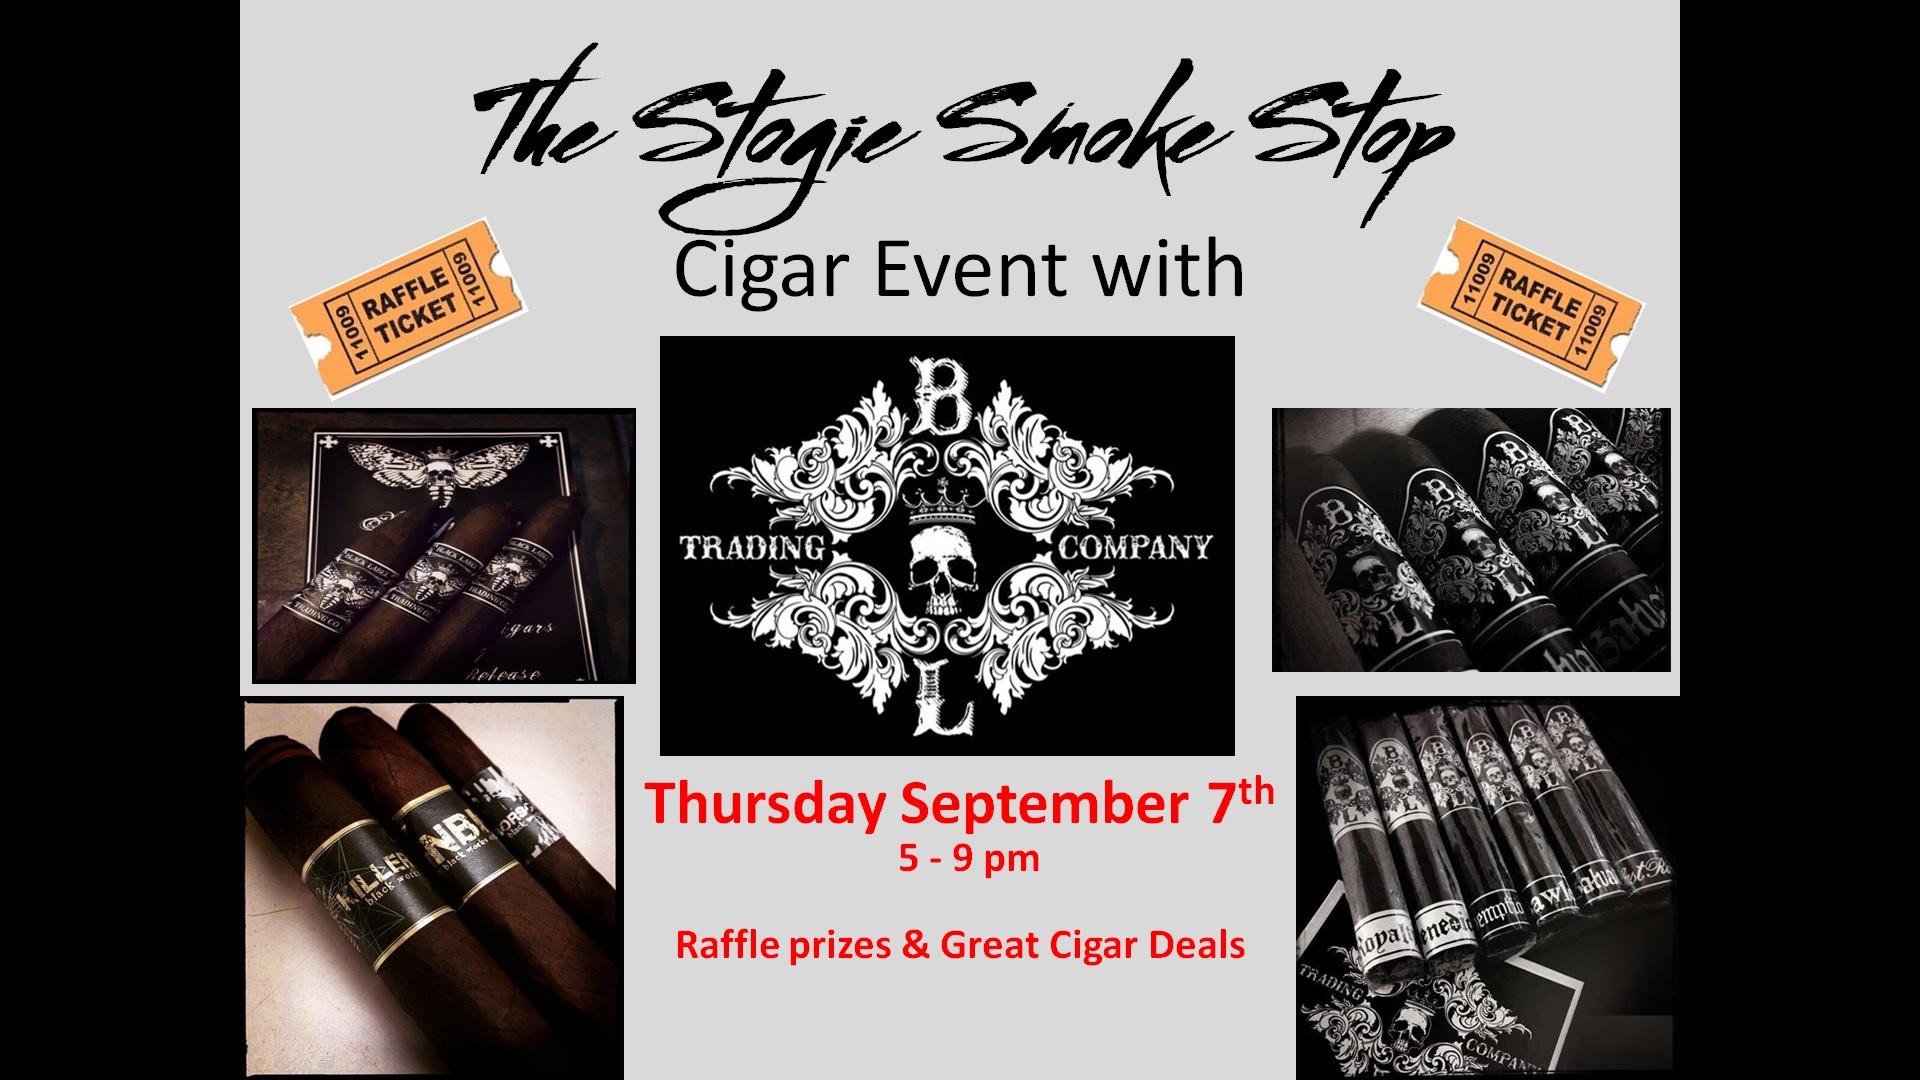 Black Label Trading Co Cigar Event